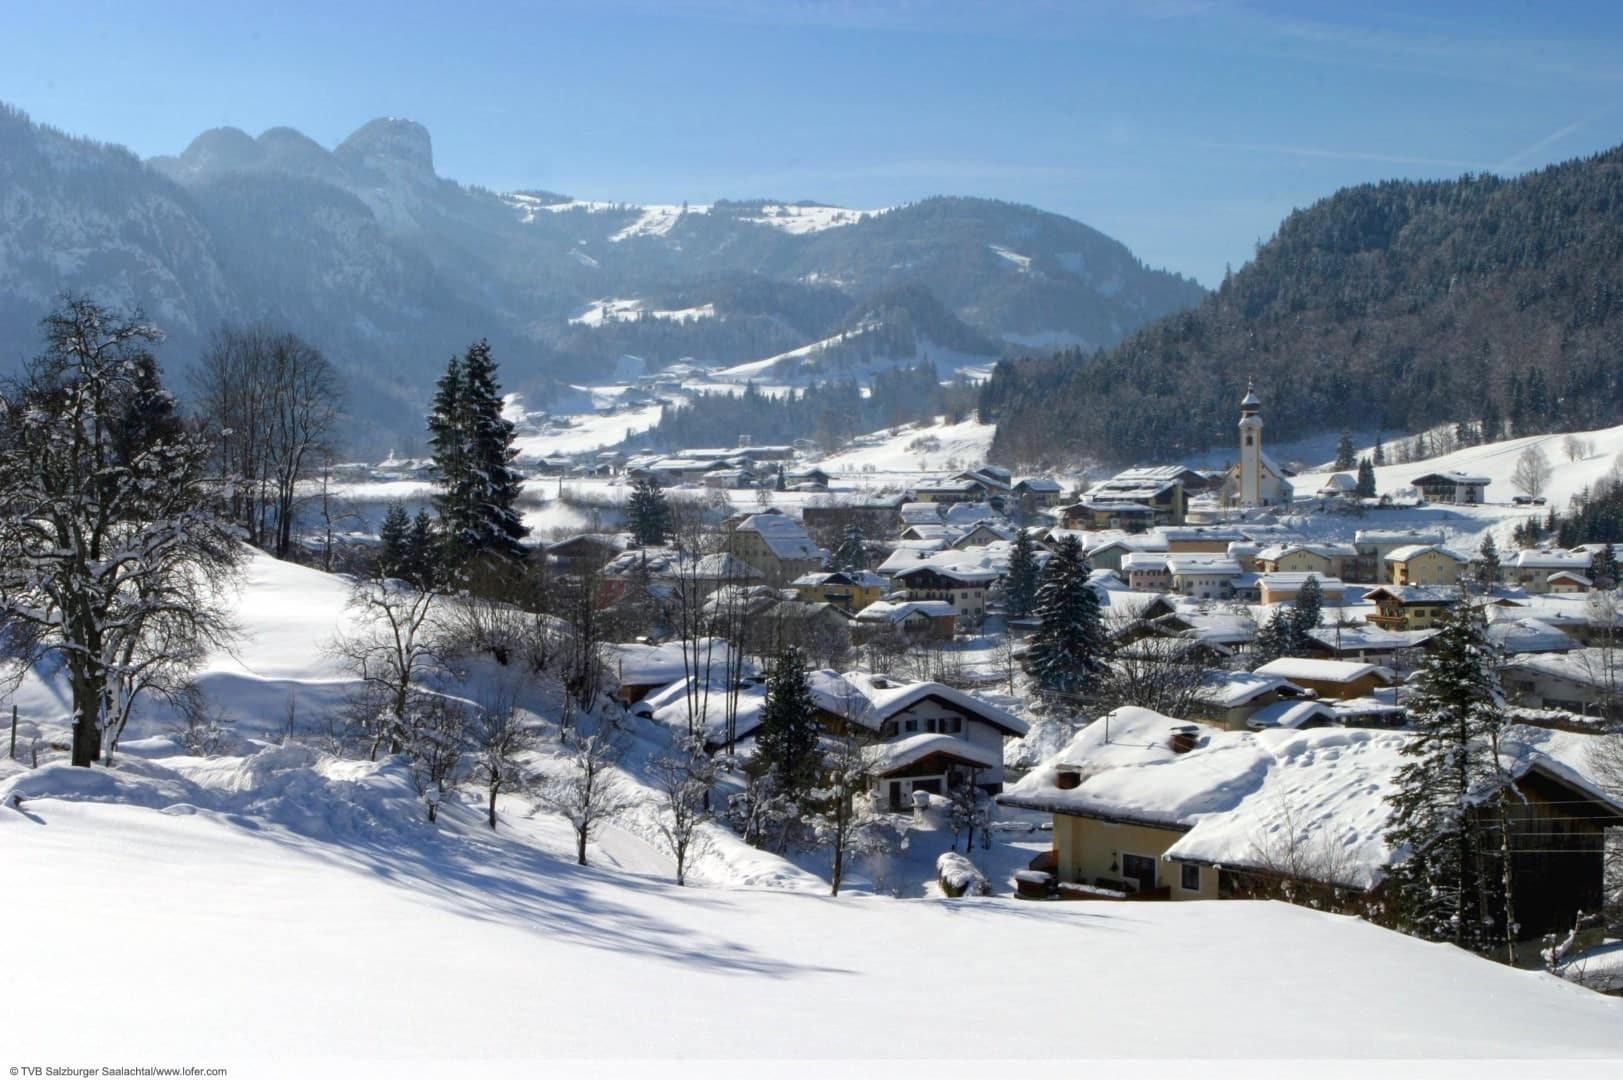 wintersport en aanbiedingen in Unken